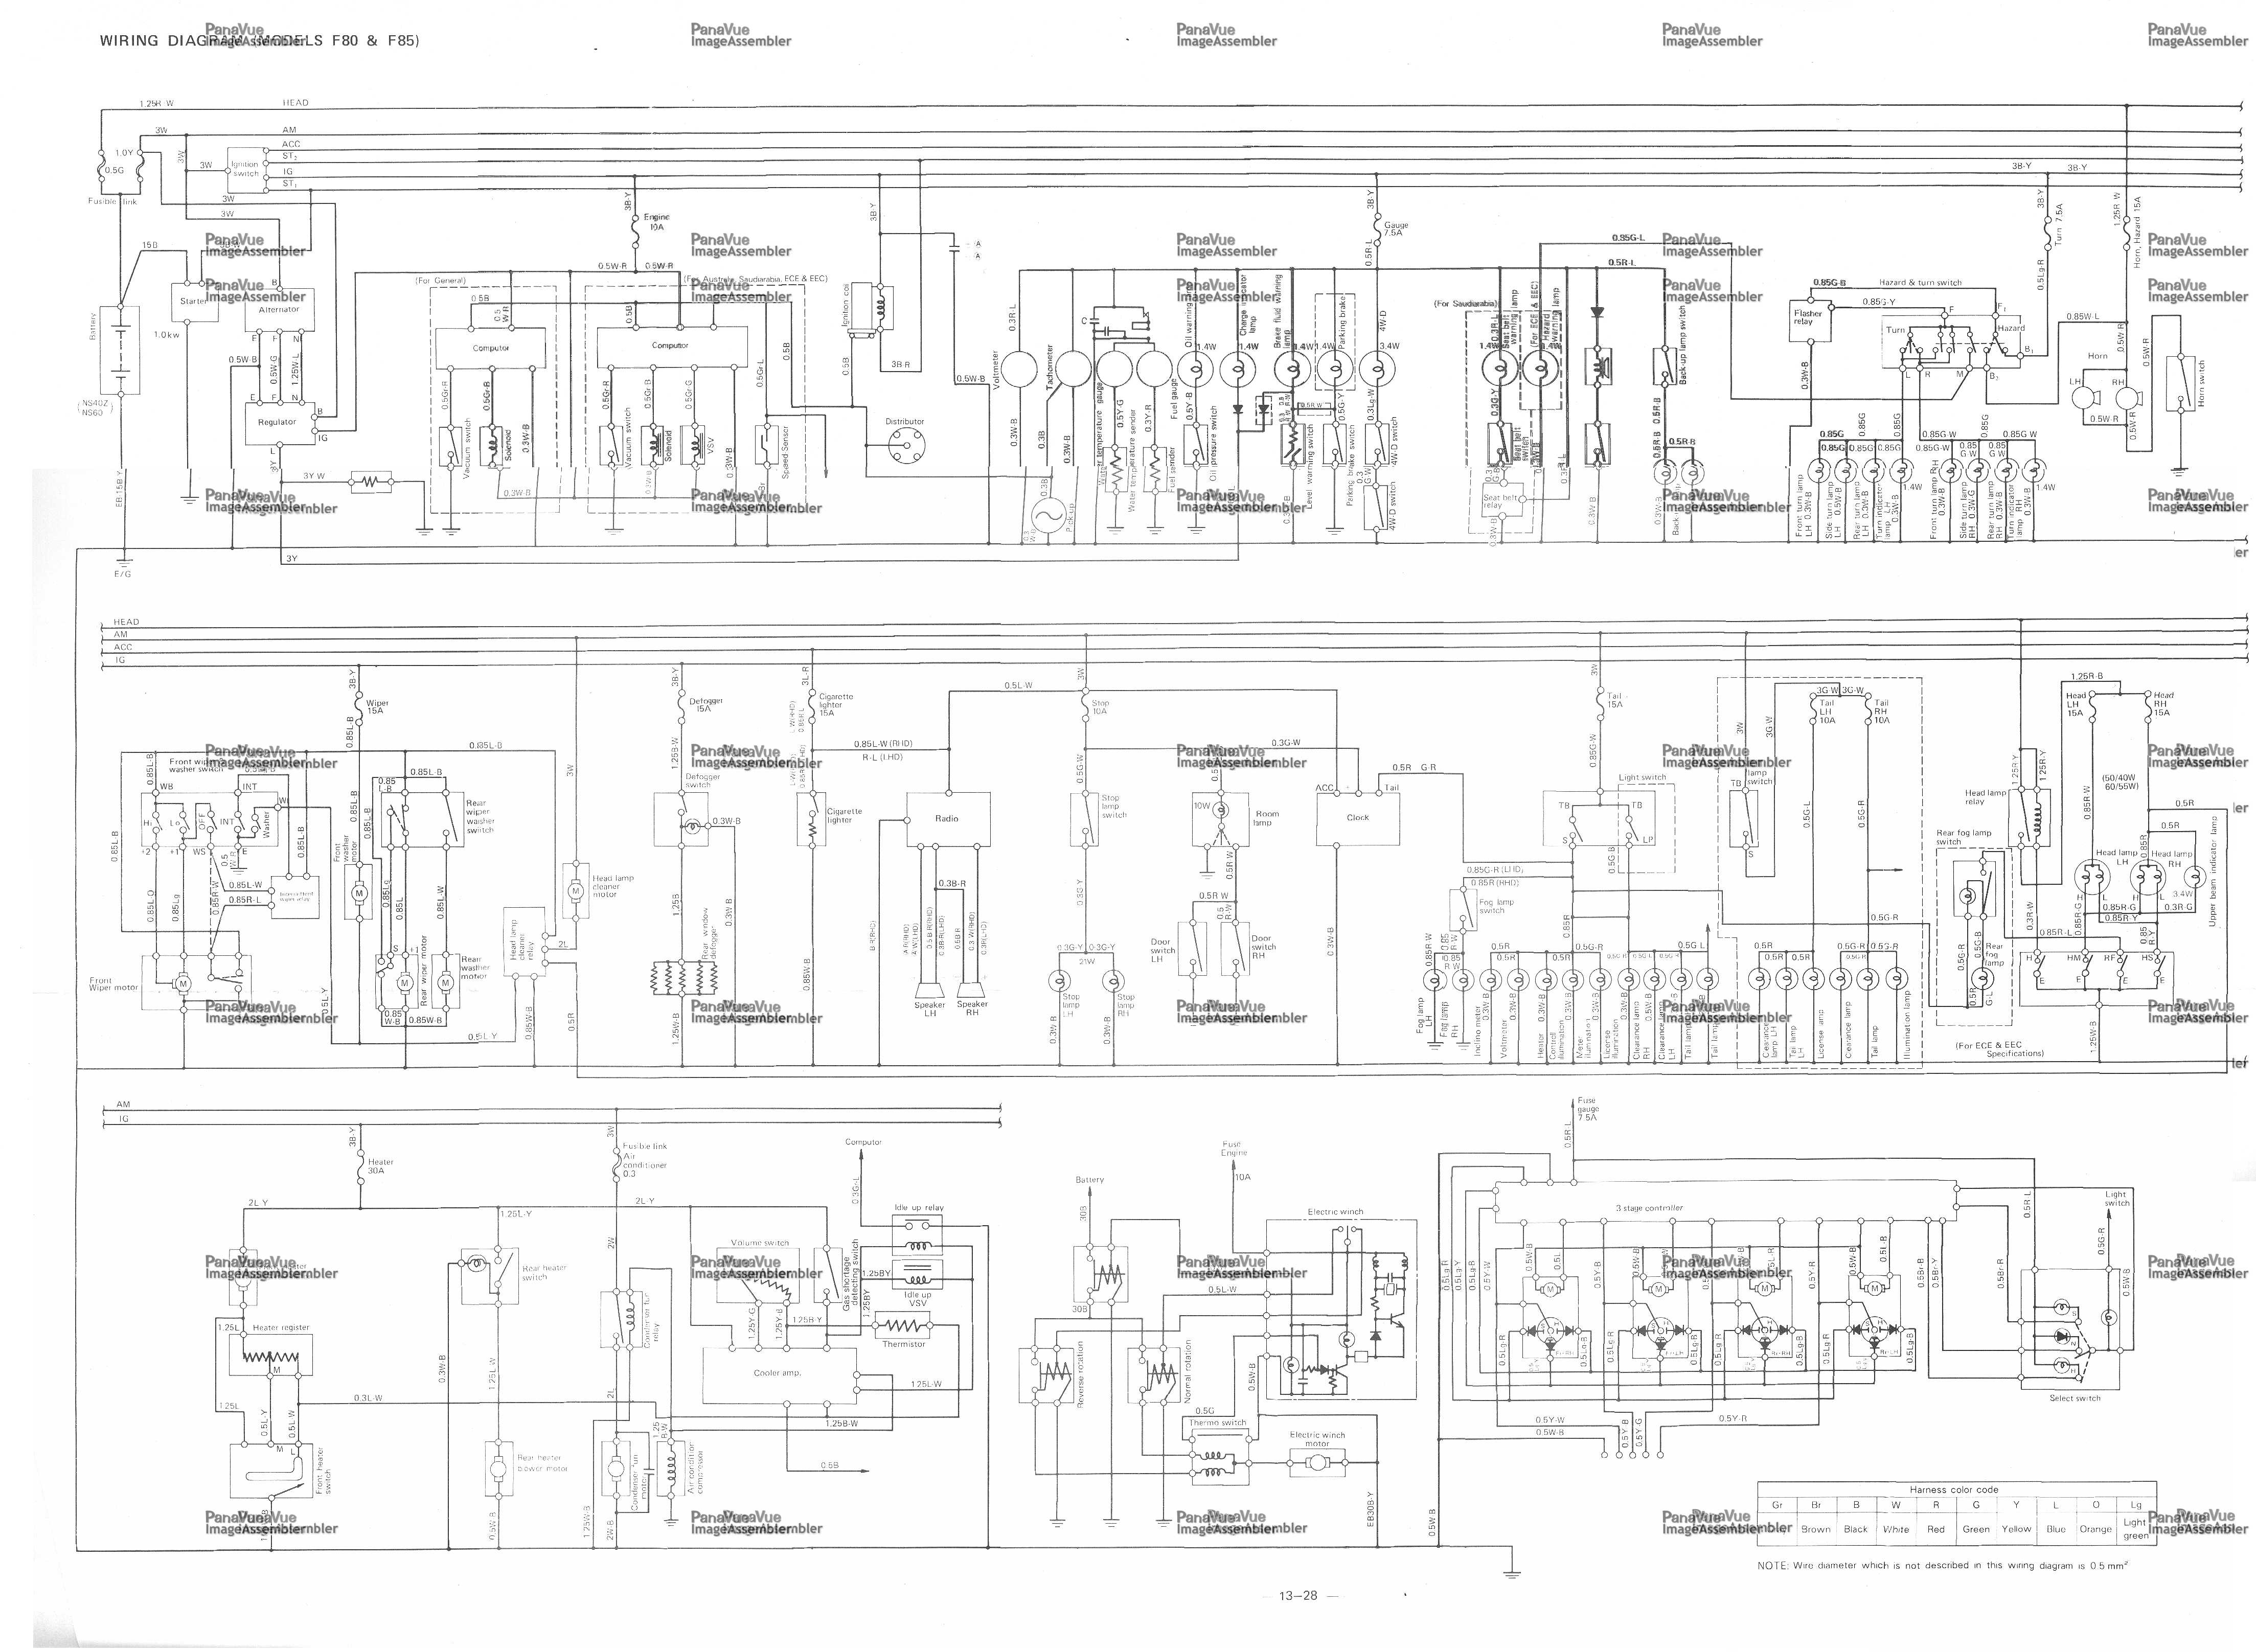 Ferrari 456 Wiring Diagram | Wiring Diagram on